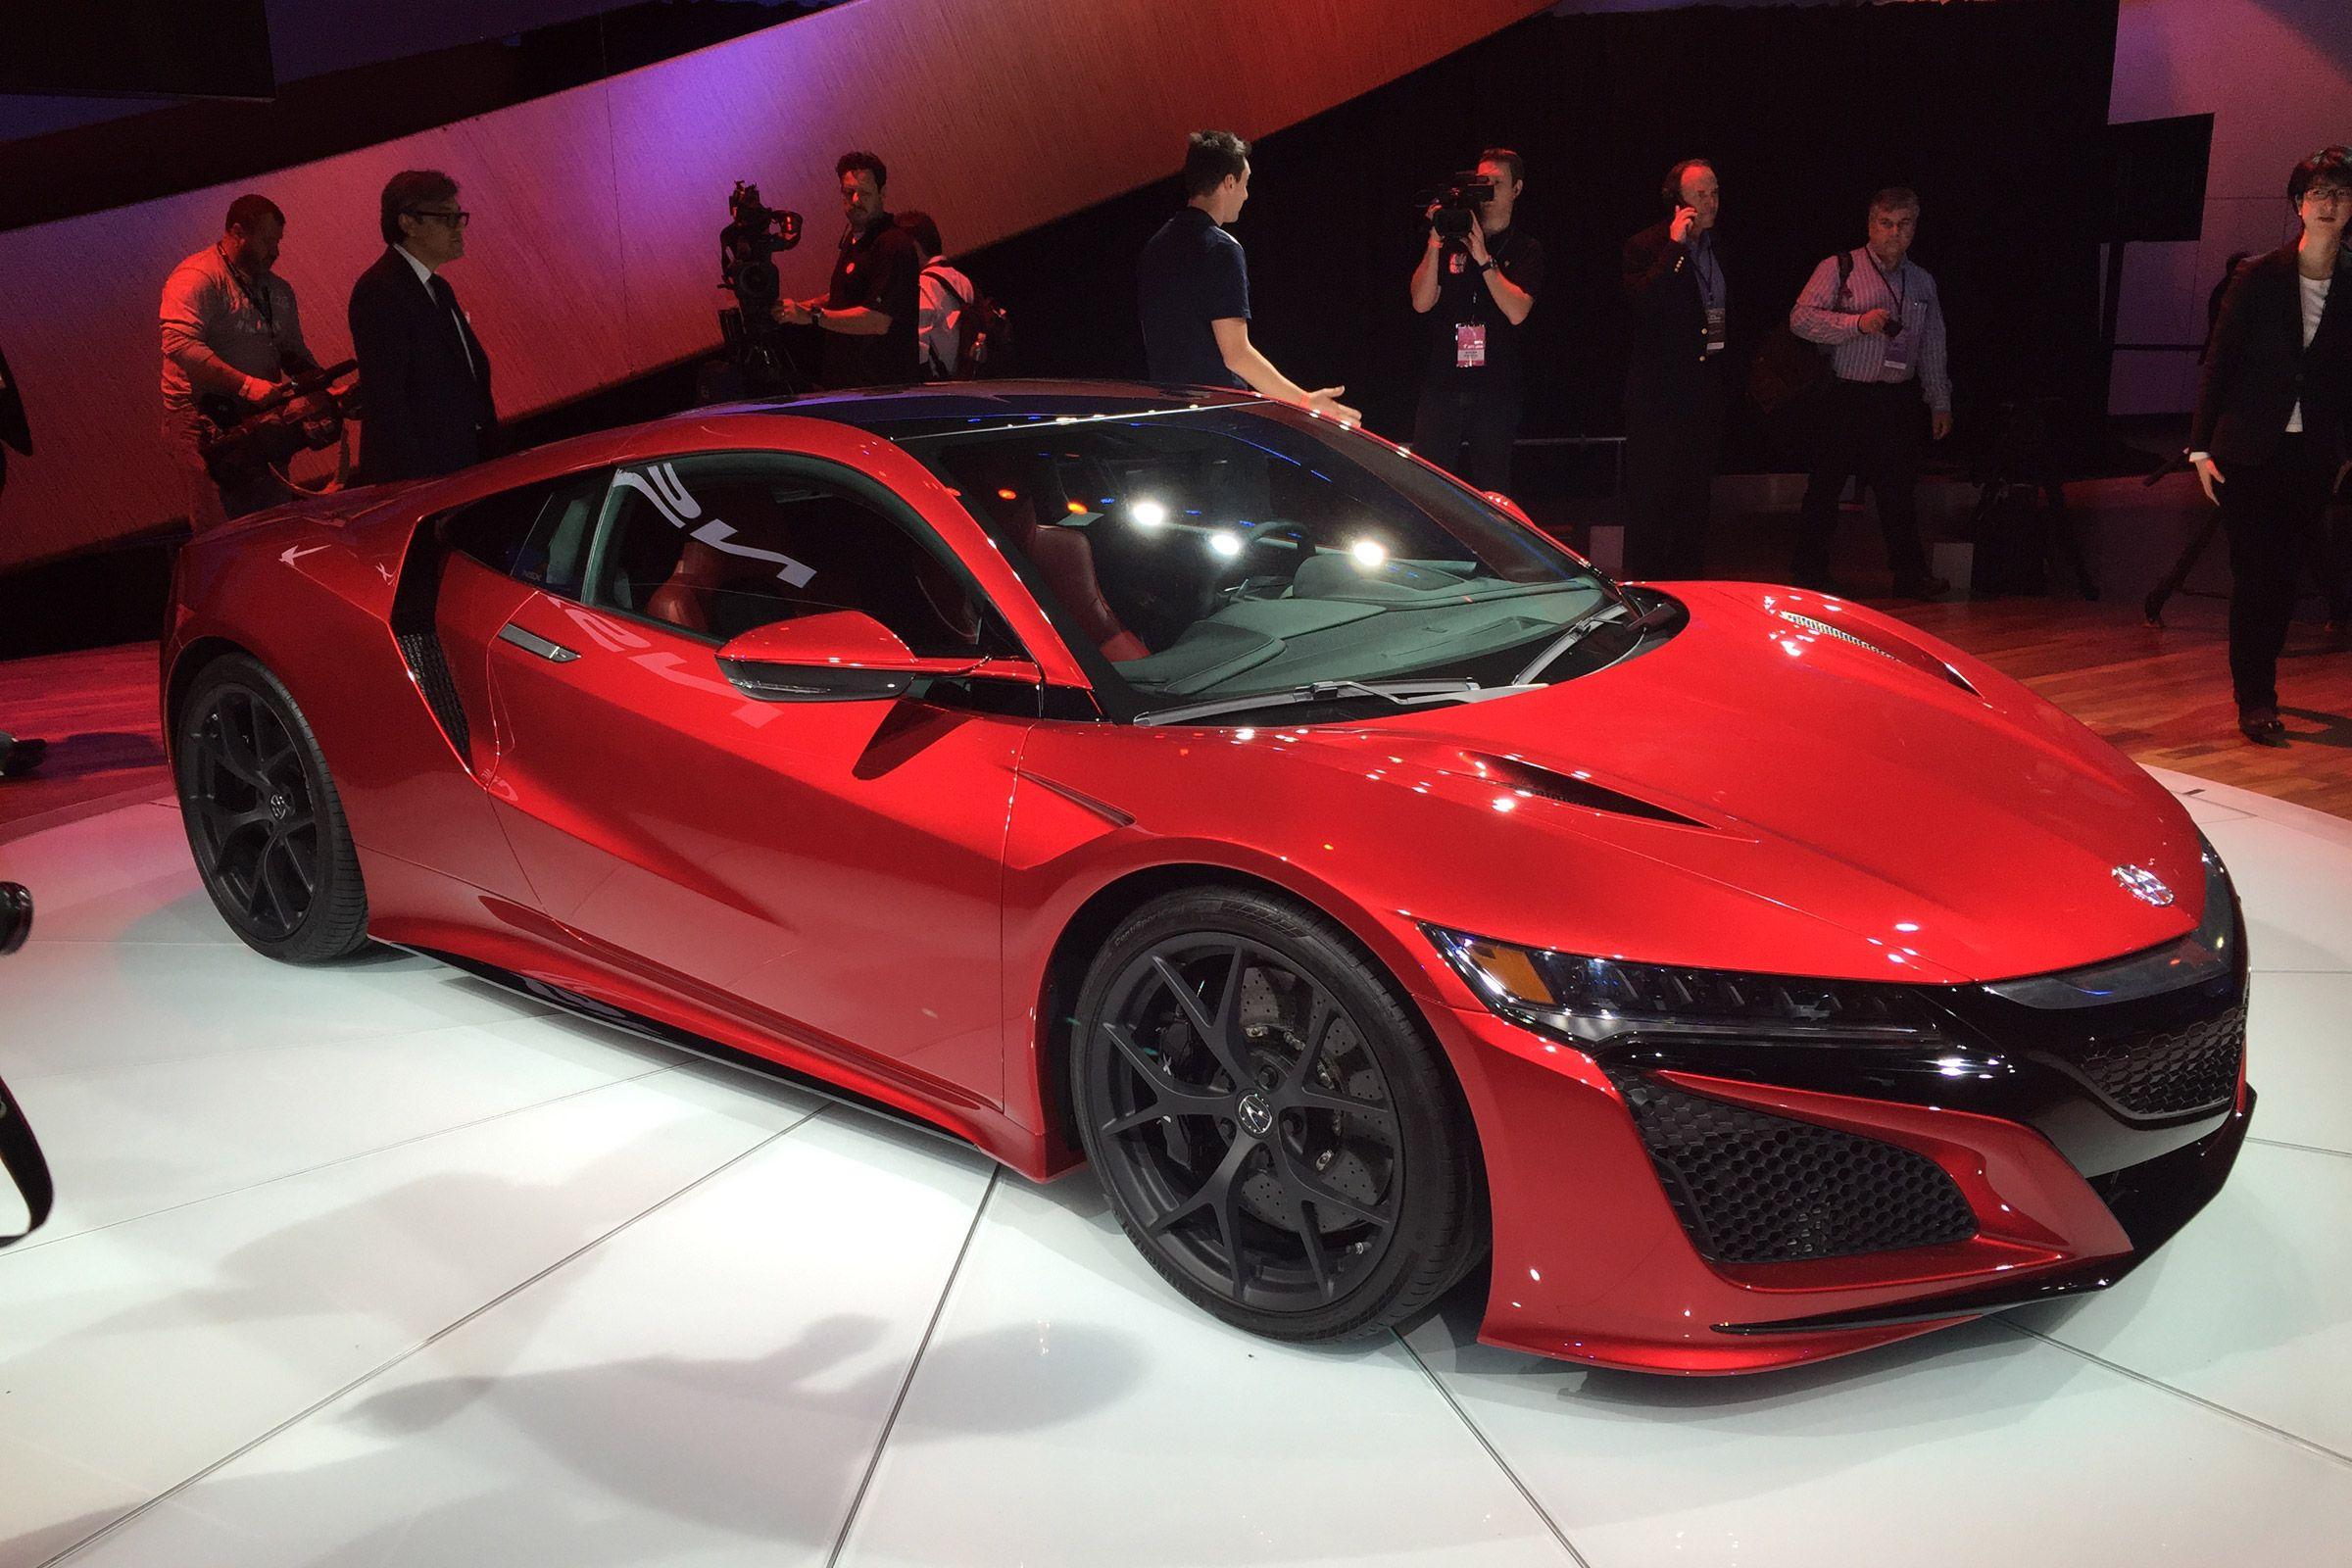 The 25 best honda nsx 2015 ideas on pinterest cool cars ferrari laferrari and honda